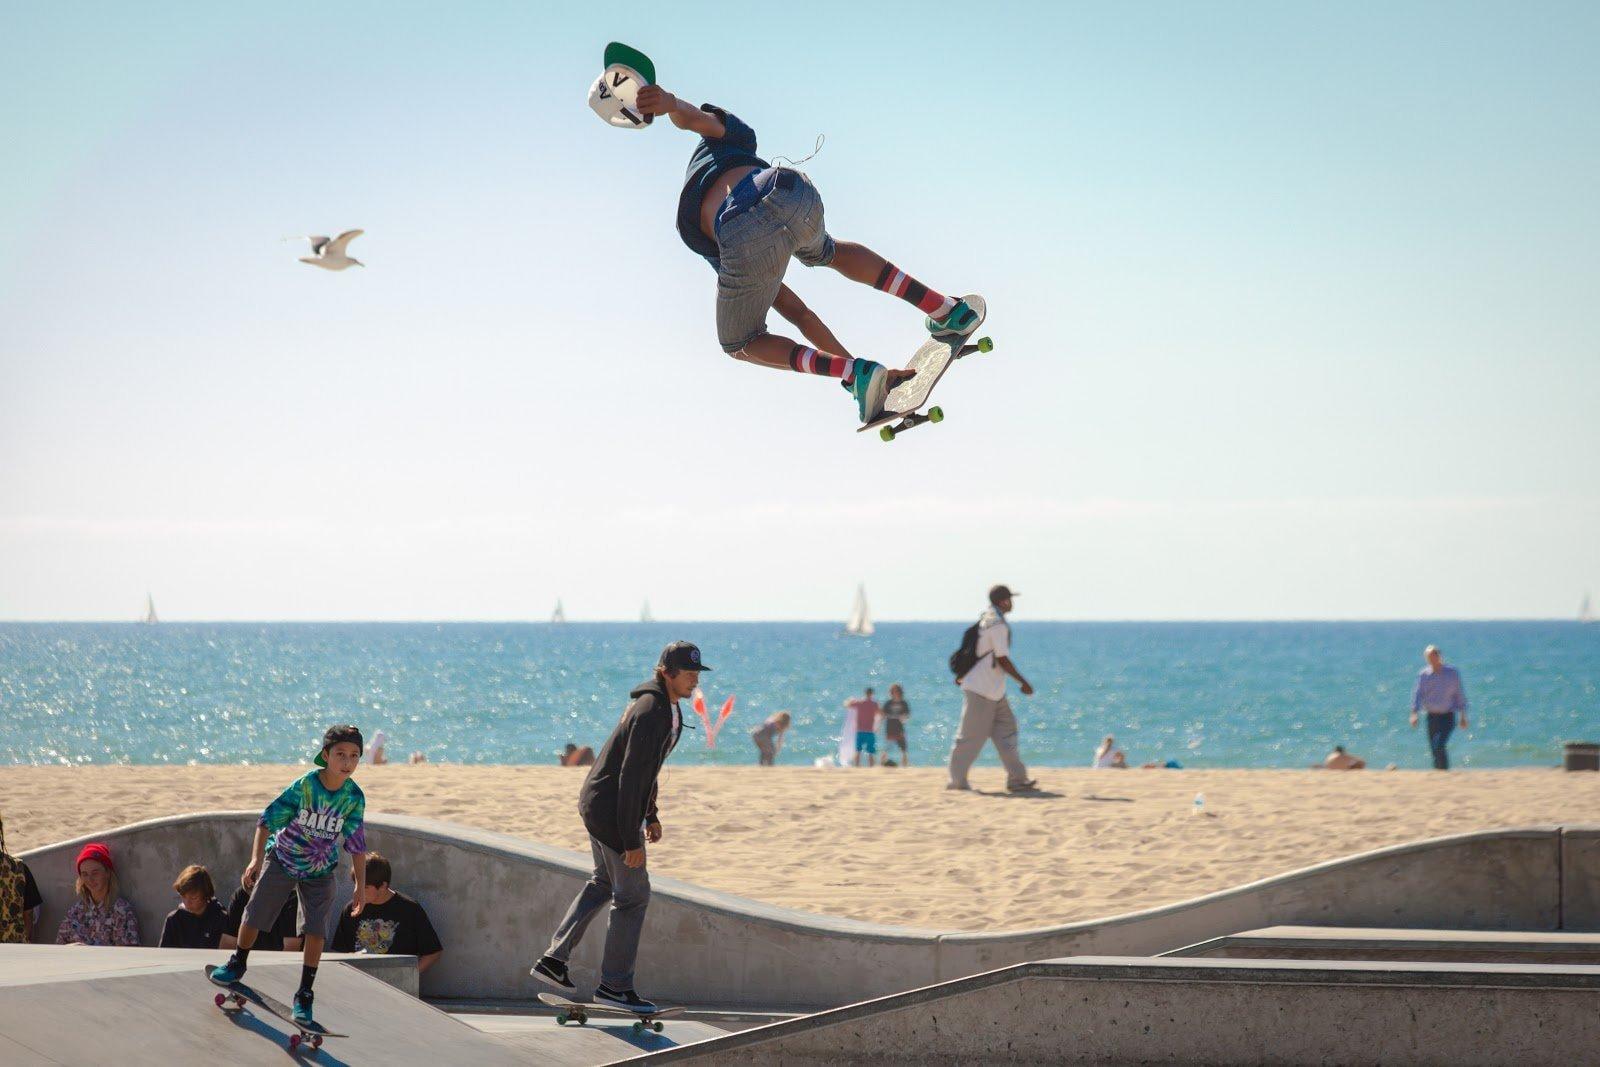 Skateboarder doing airtime by Chris Brignola